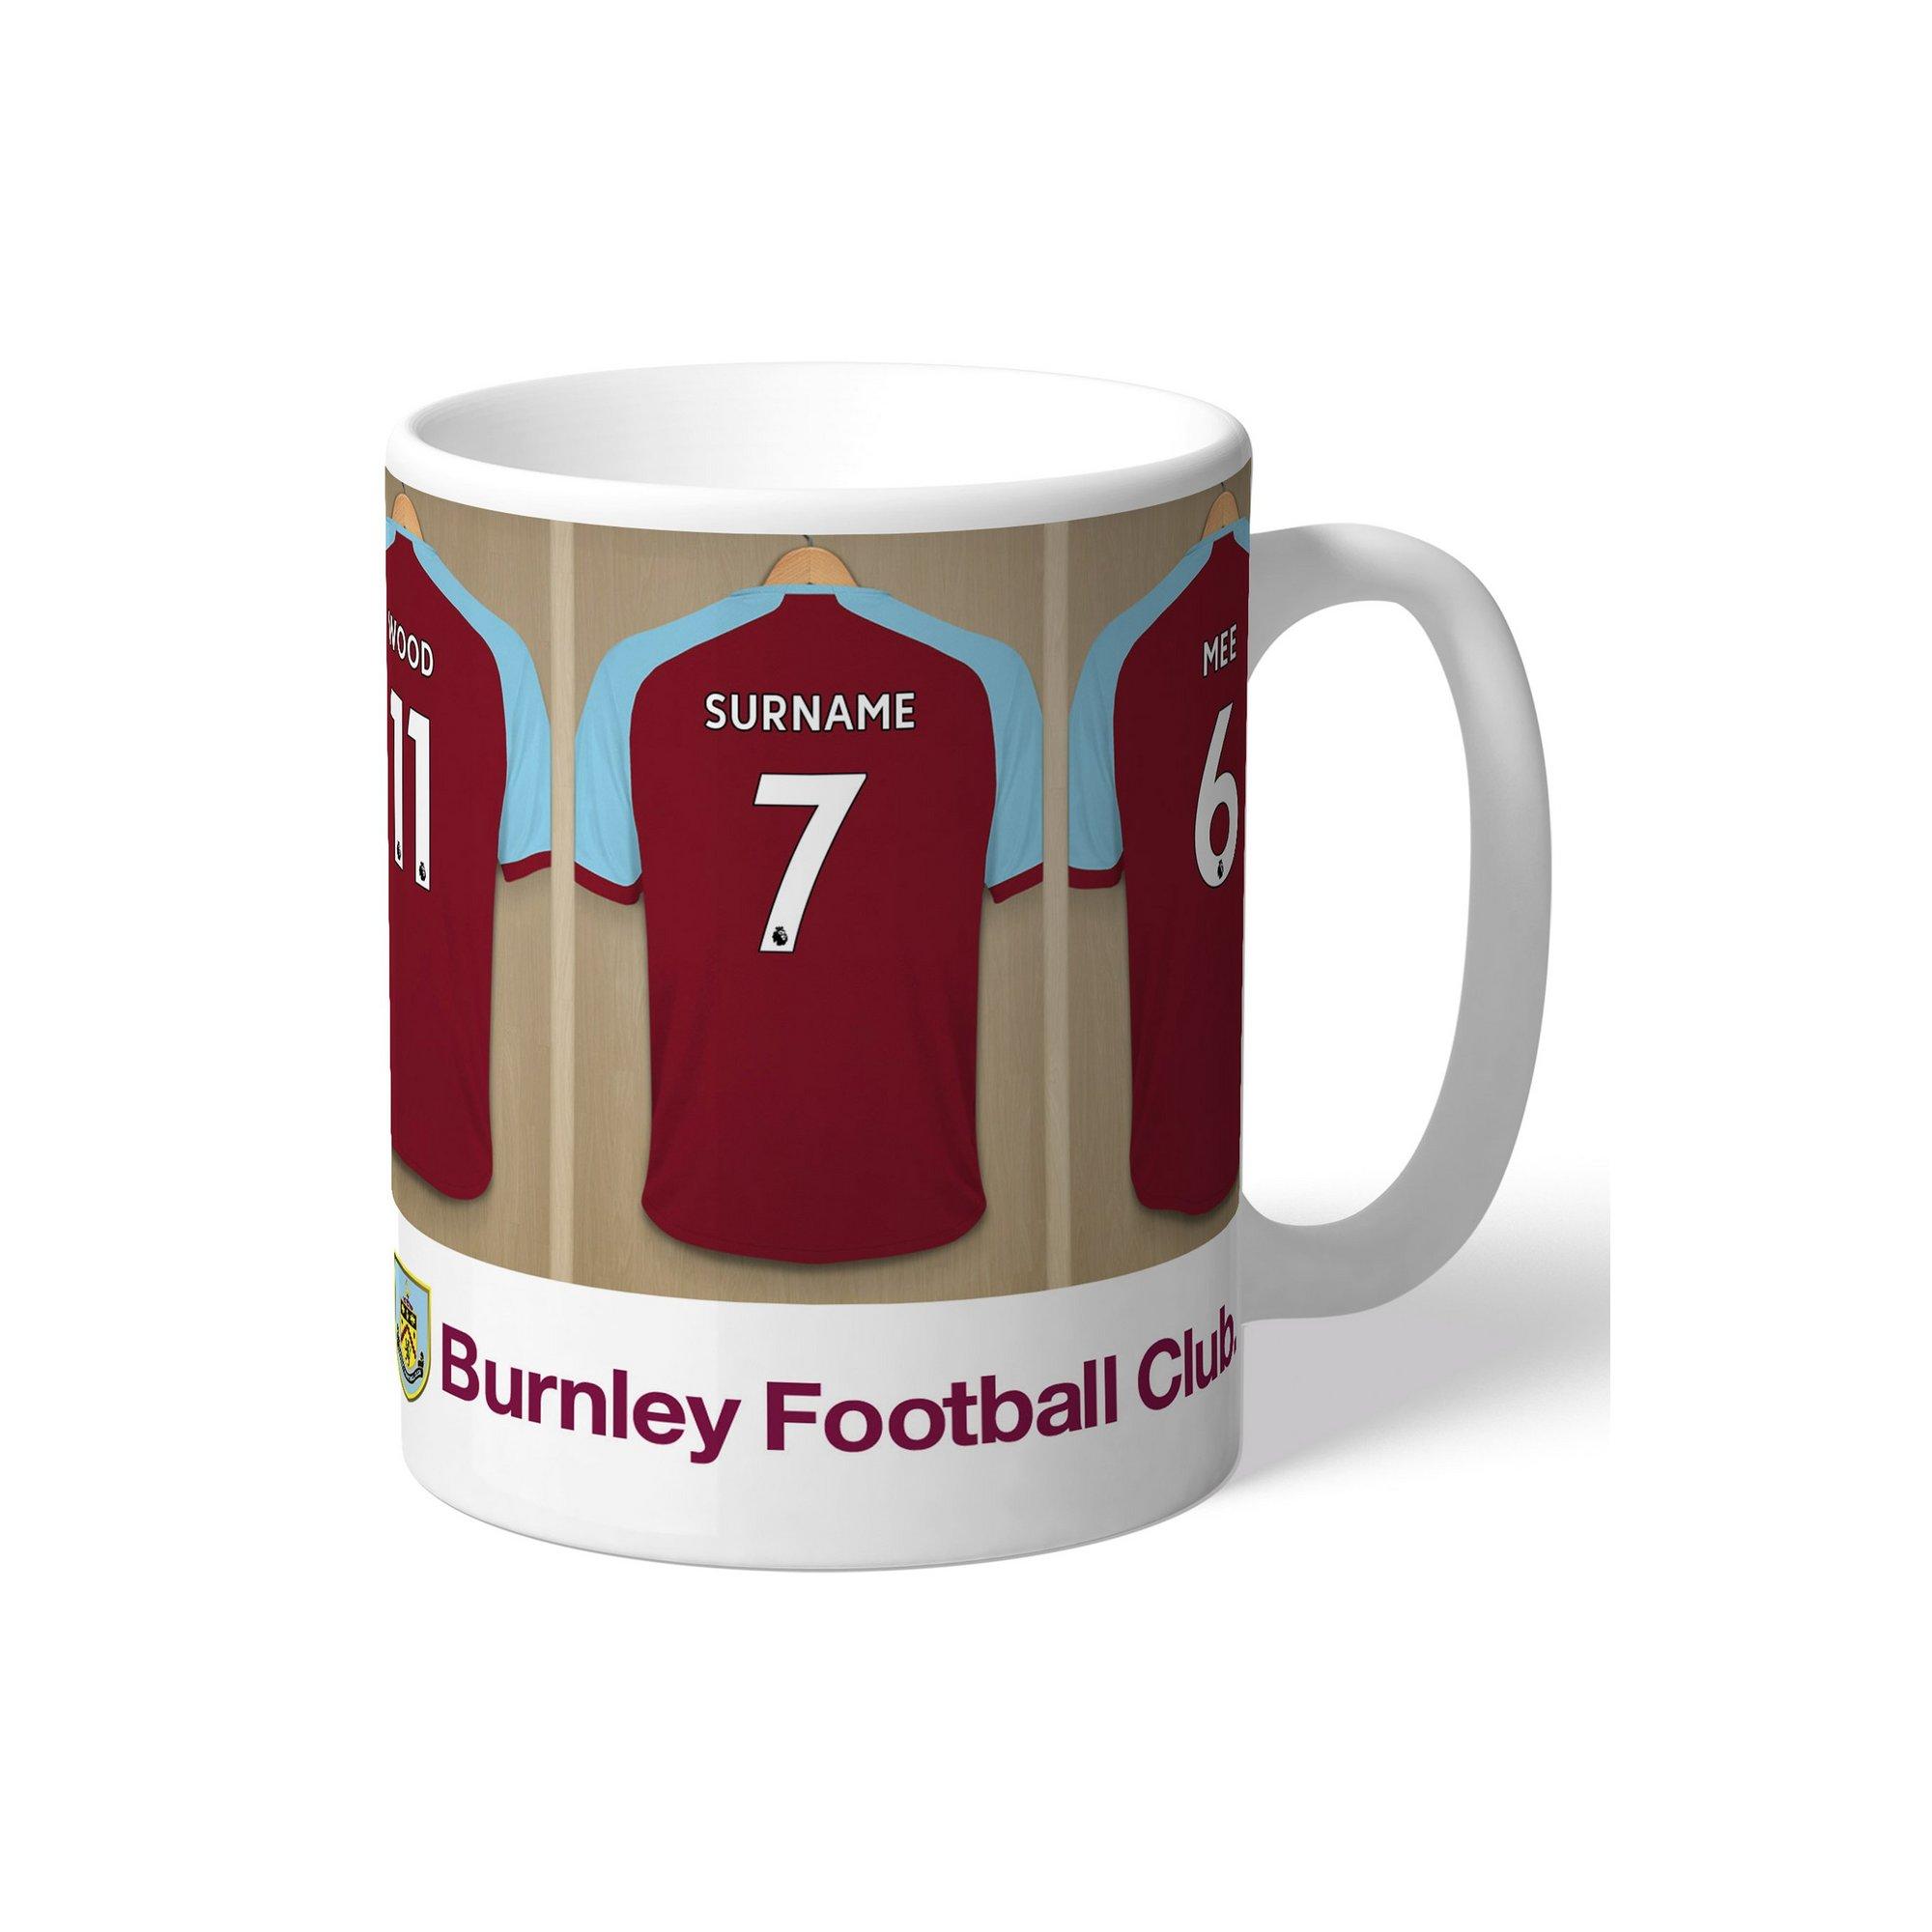 Image of Personalised Burnley FC Dressing Room Mug